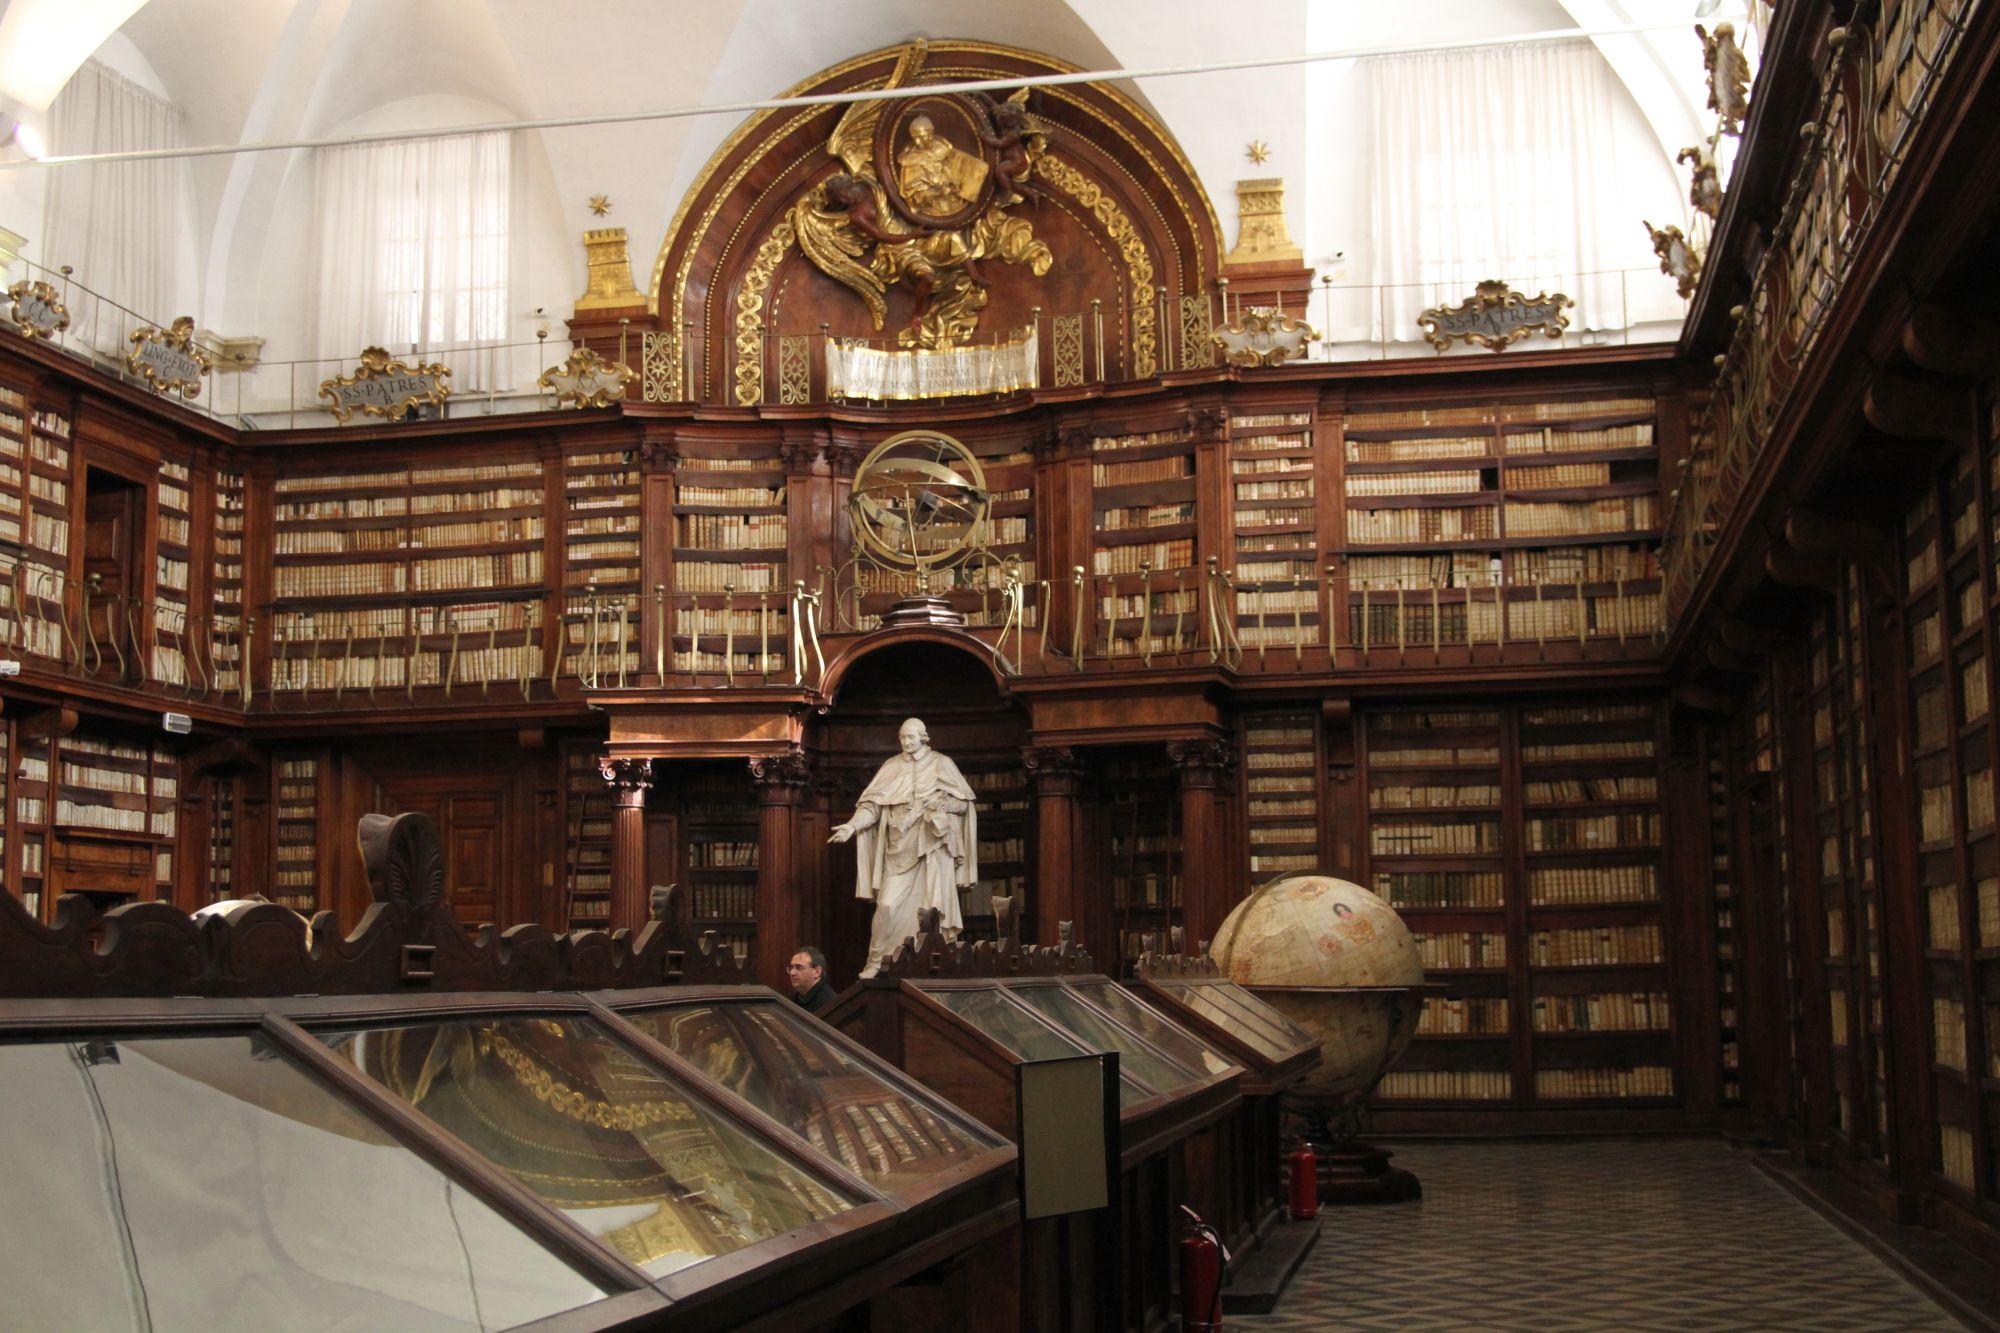 biblioteca orbassano san luigi rome - photo#36